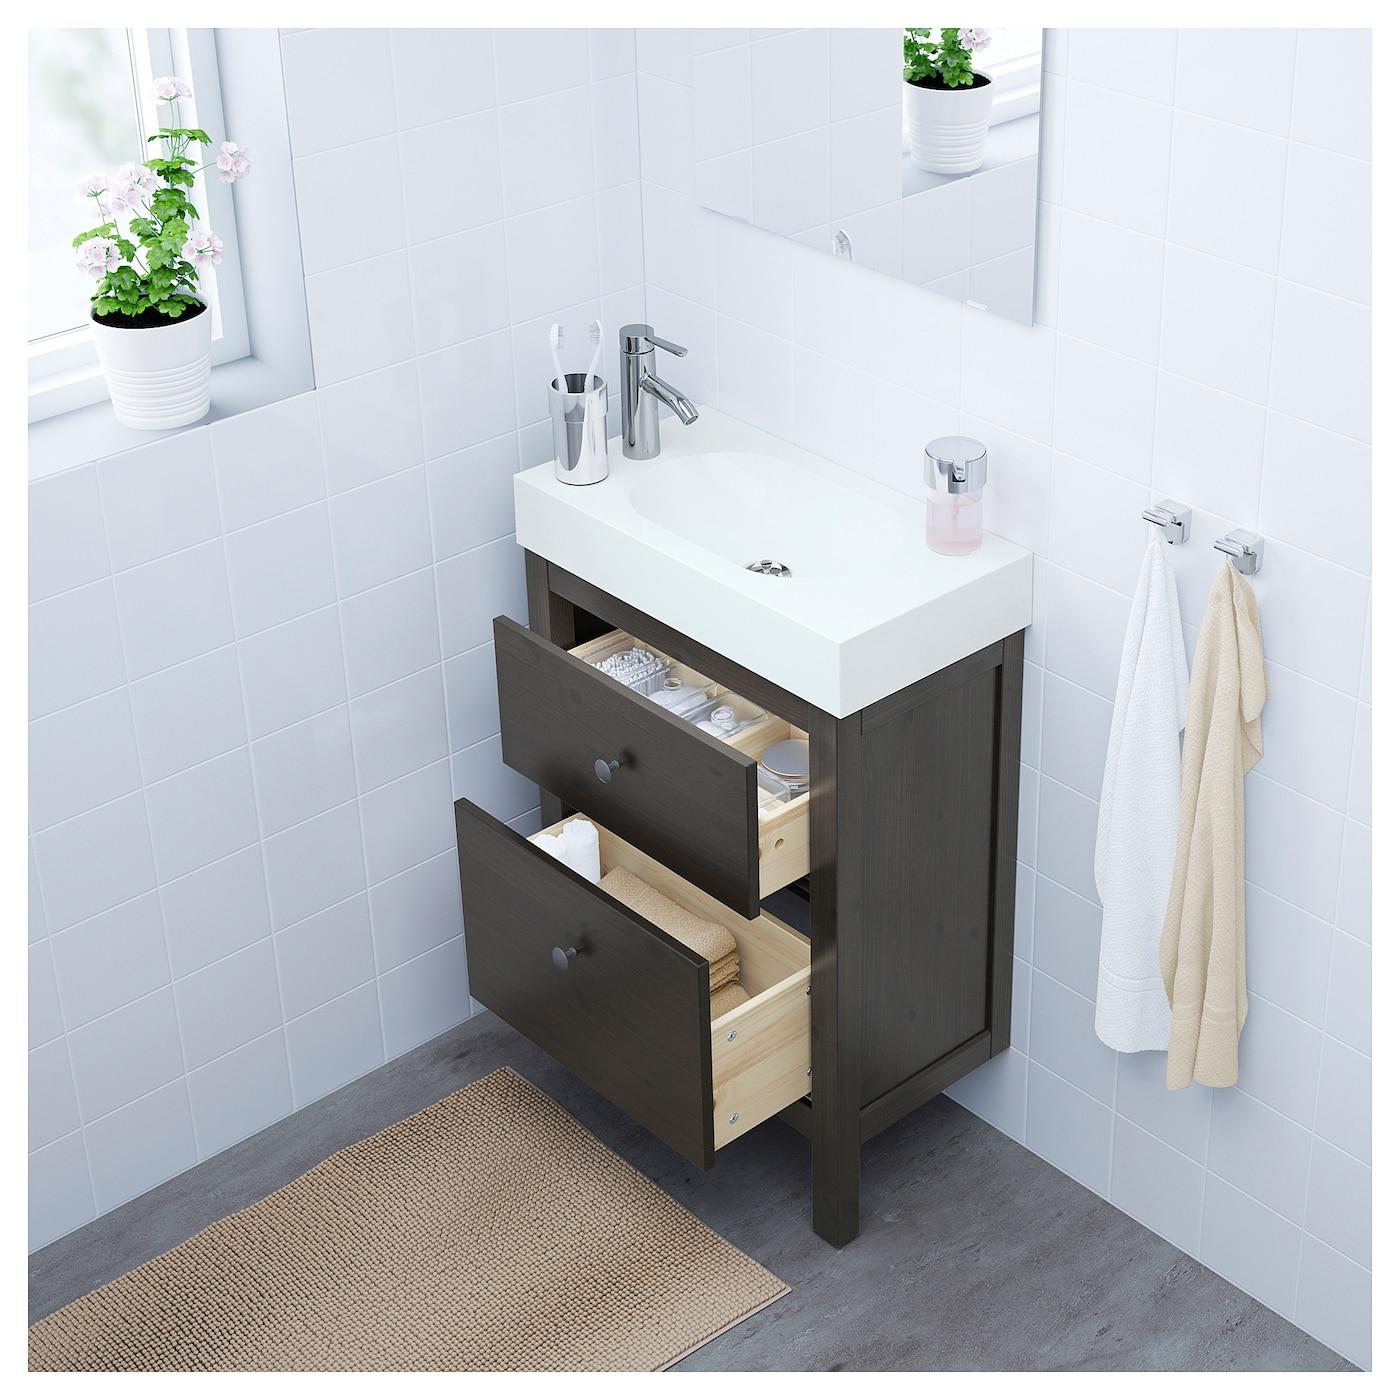 br viken hemnes meuble lavabo 2tir brun noir 62 x 33 x 93 cm ikea. Black Bedroom Furniture Sets. Home Design Ideas